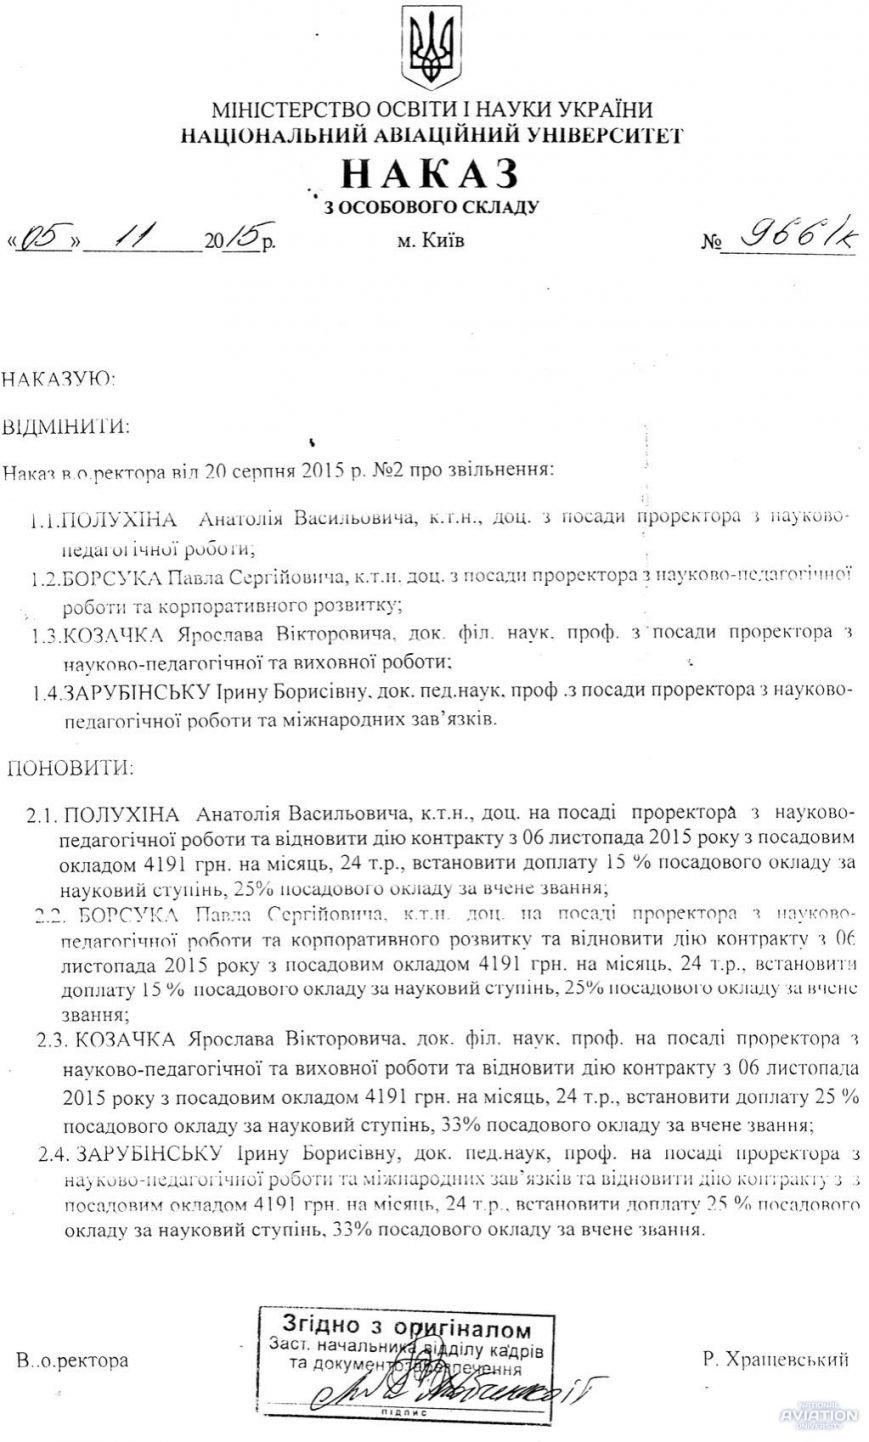 Кума Табачника восстановили в должности проректора НАУ, - СМИ (Документ) (фото) - фото 2